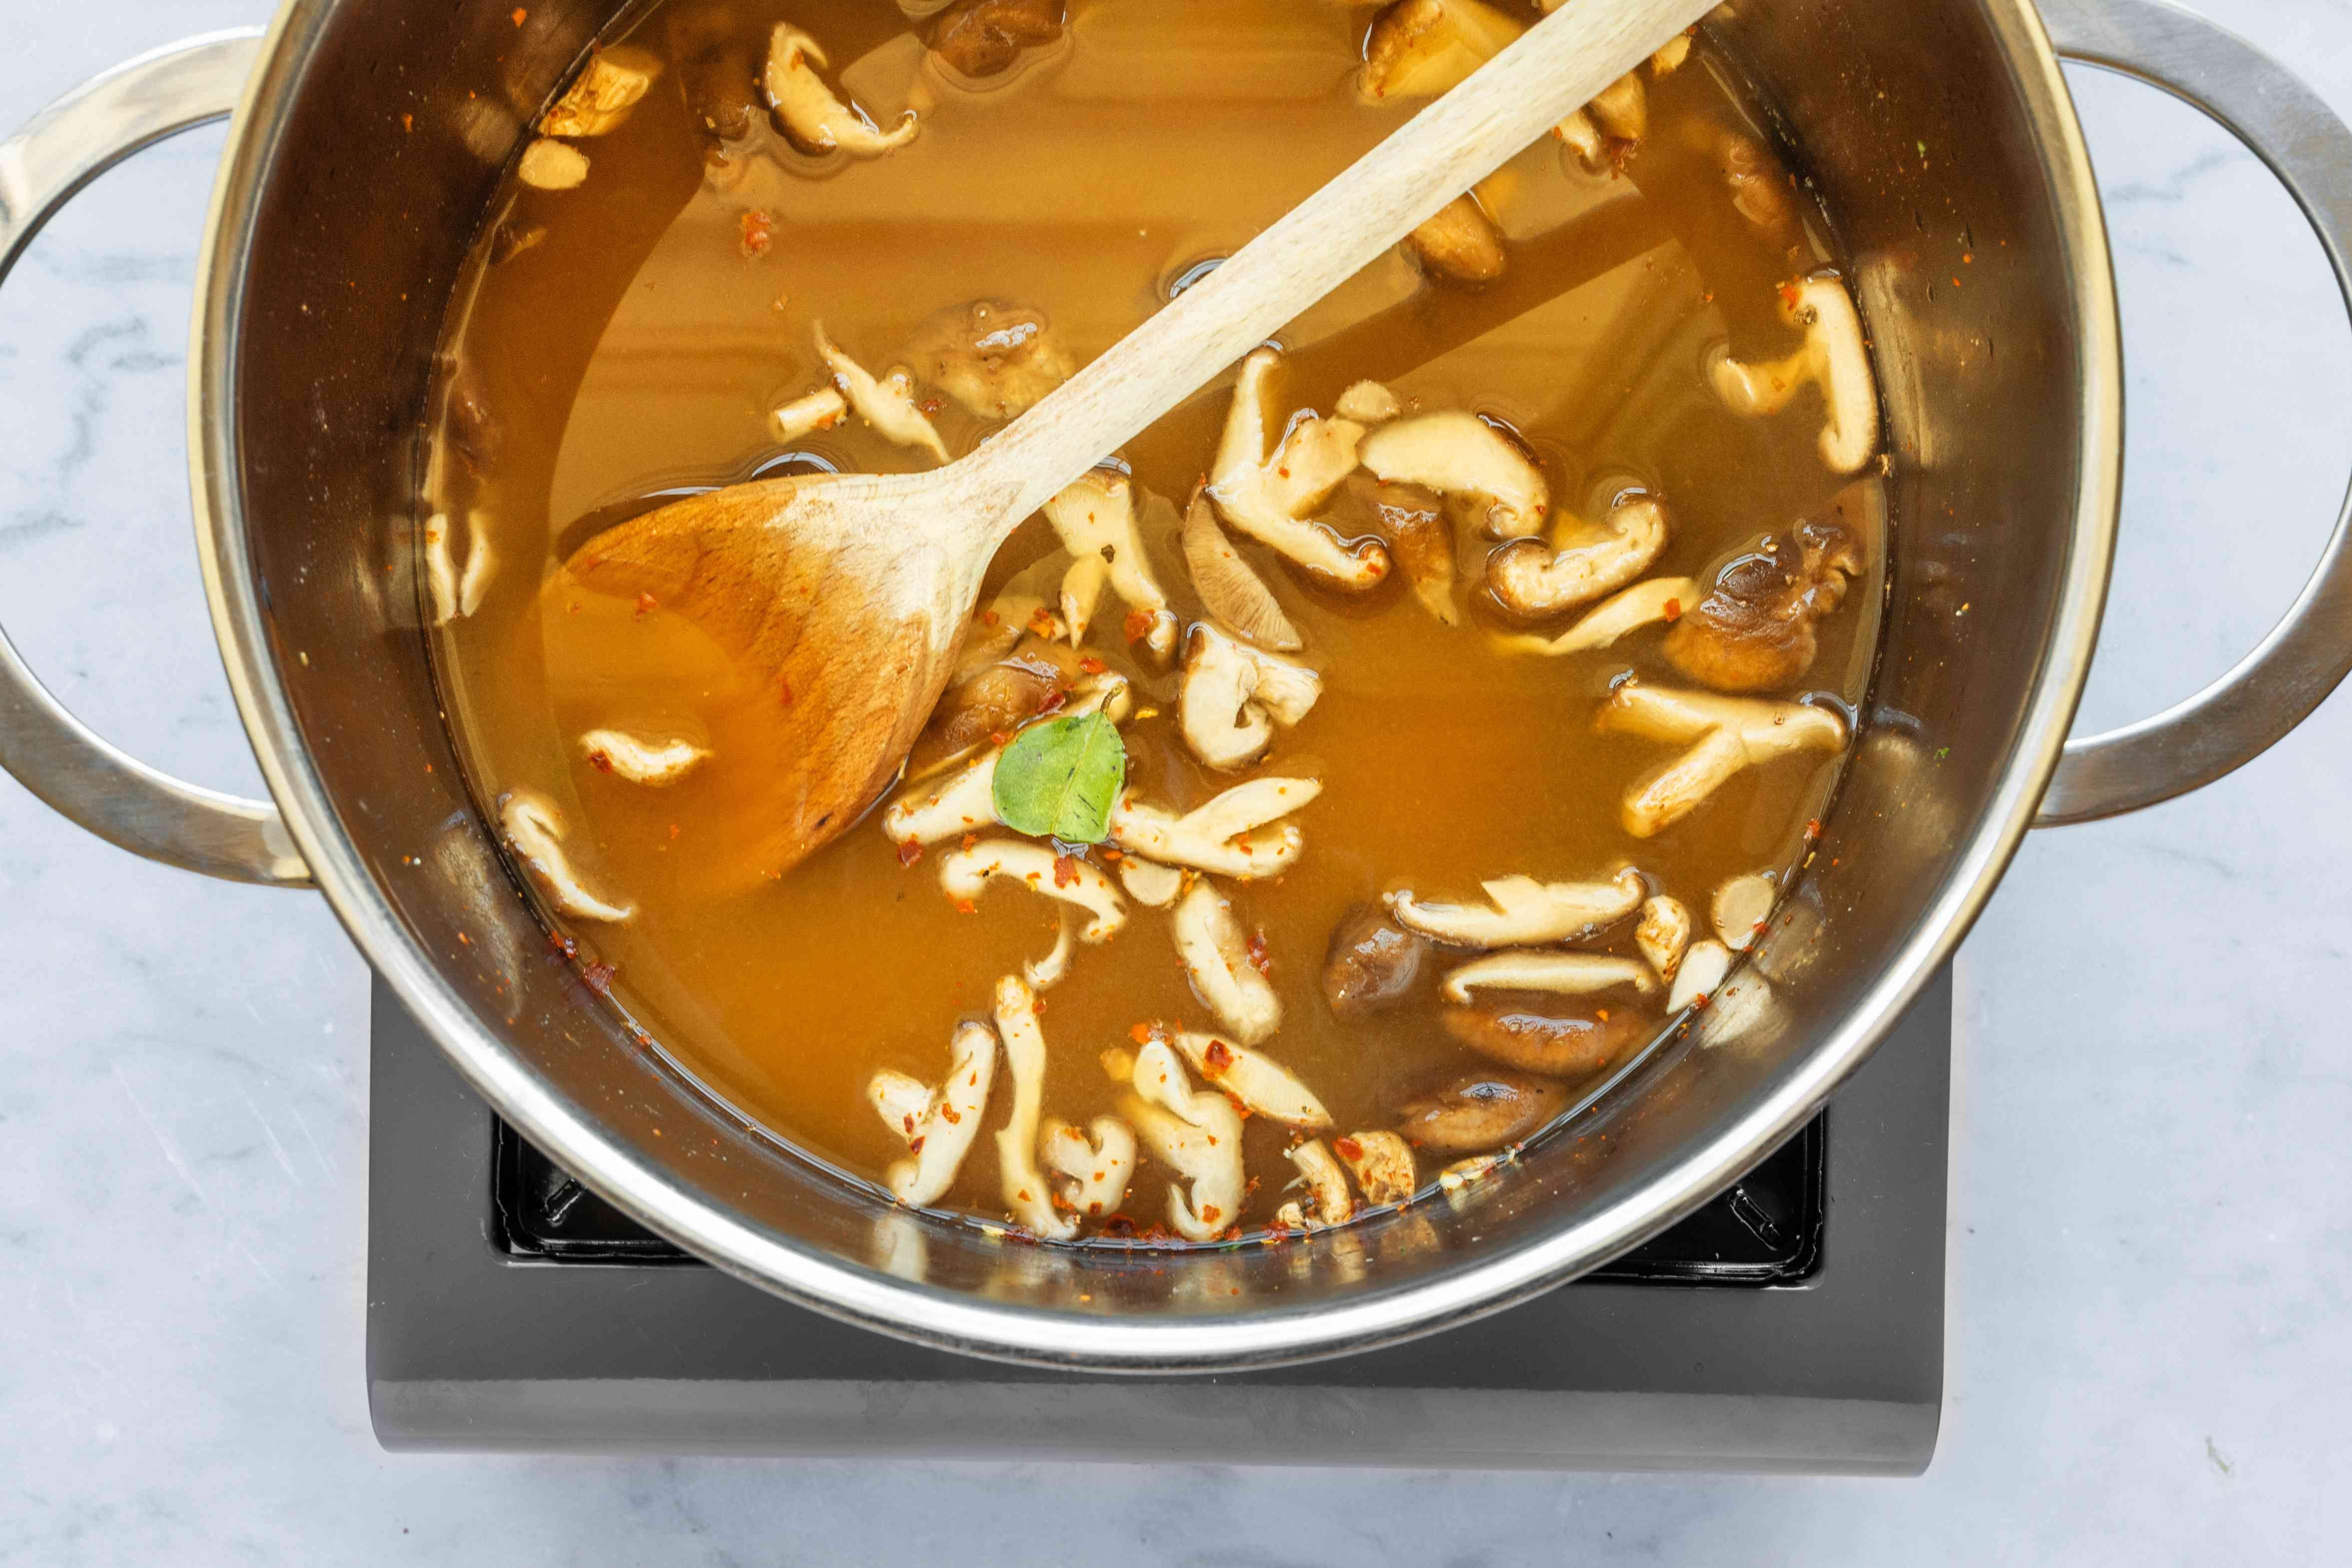 Add garlic, chili, lime leaves